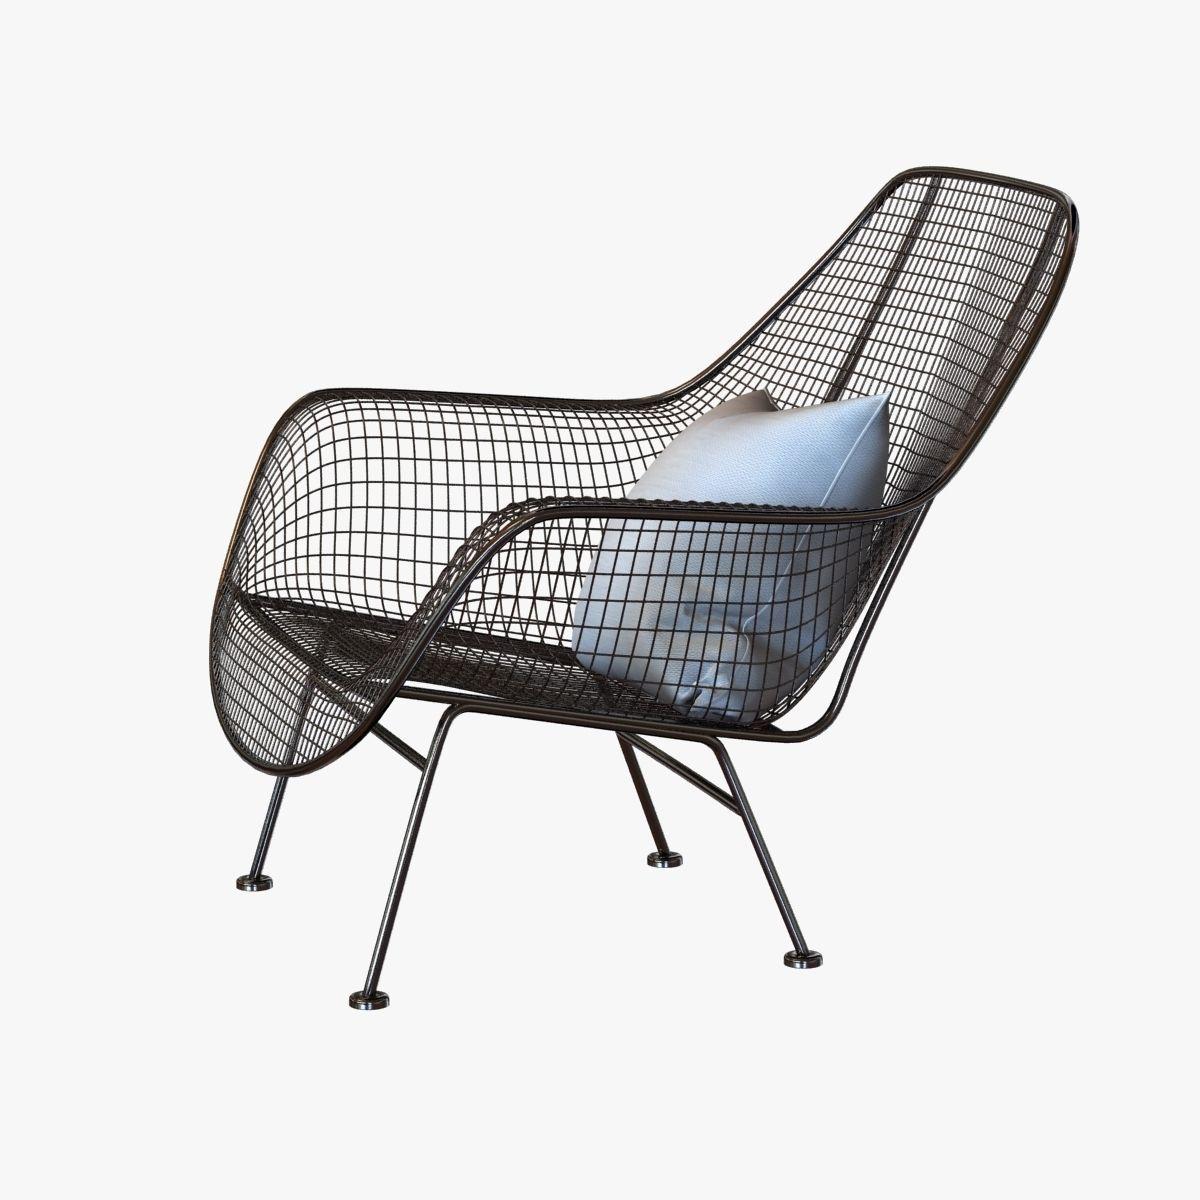 Charmant Mid Century Sculptura Garden Lounge Chair By Woodard 3d Model Max Obj 3ds  Fbx Mtl ...